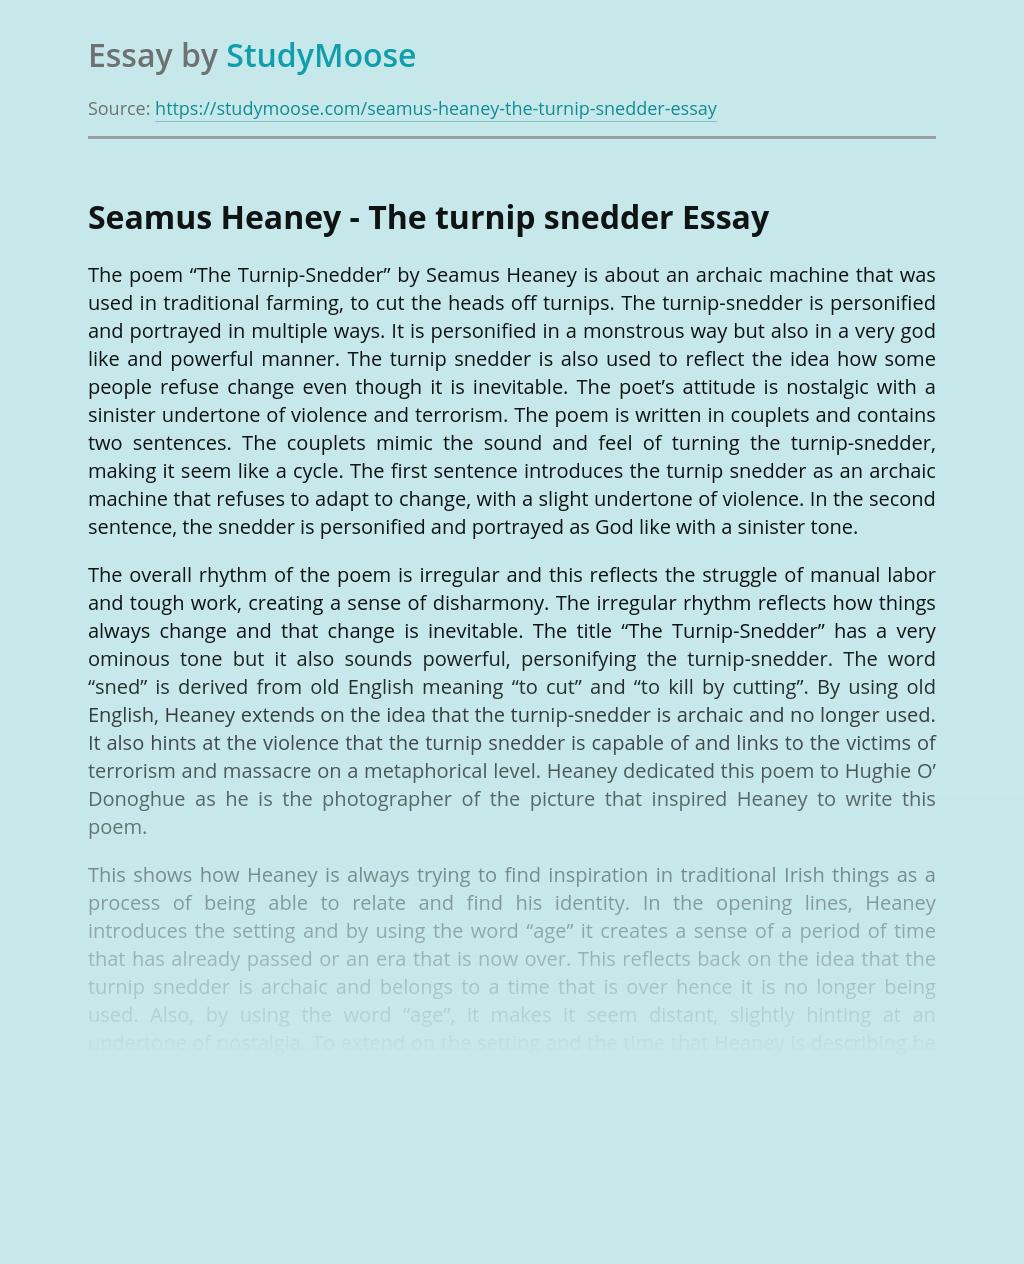 Seamus Heaney - The turnip snedder